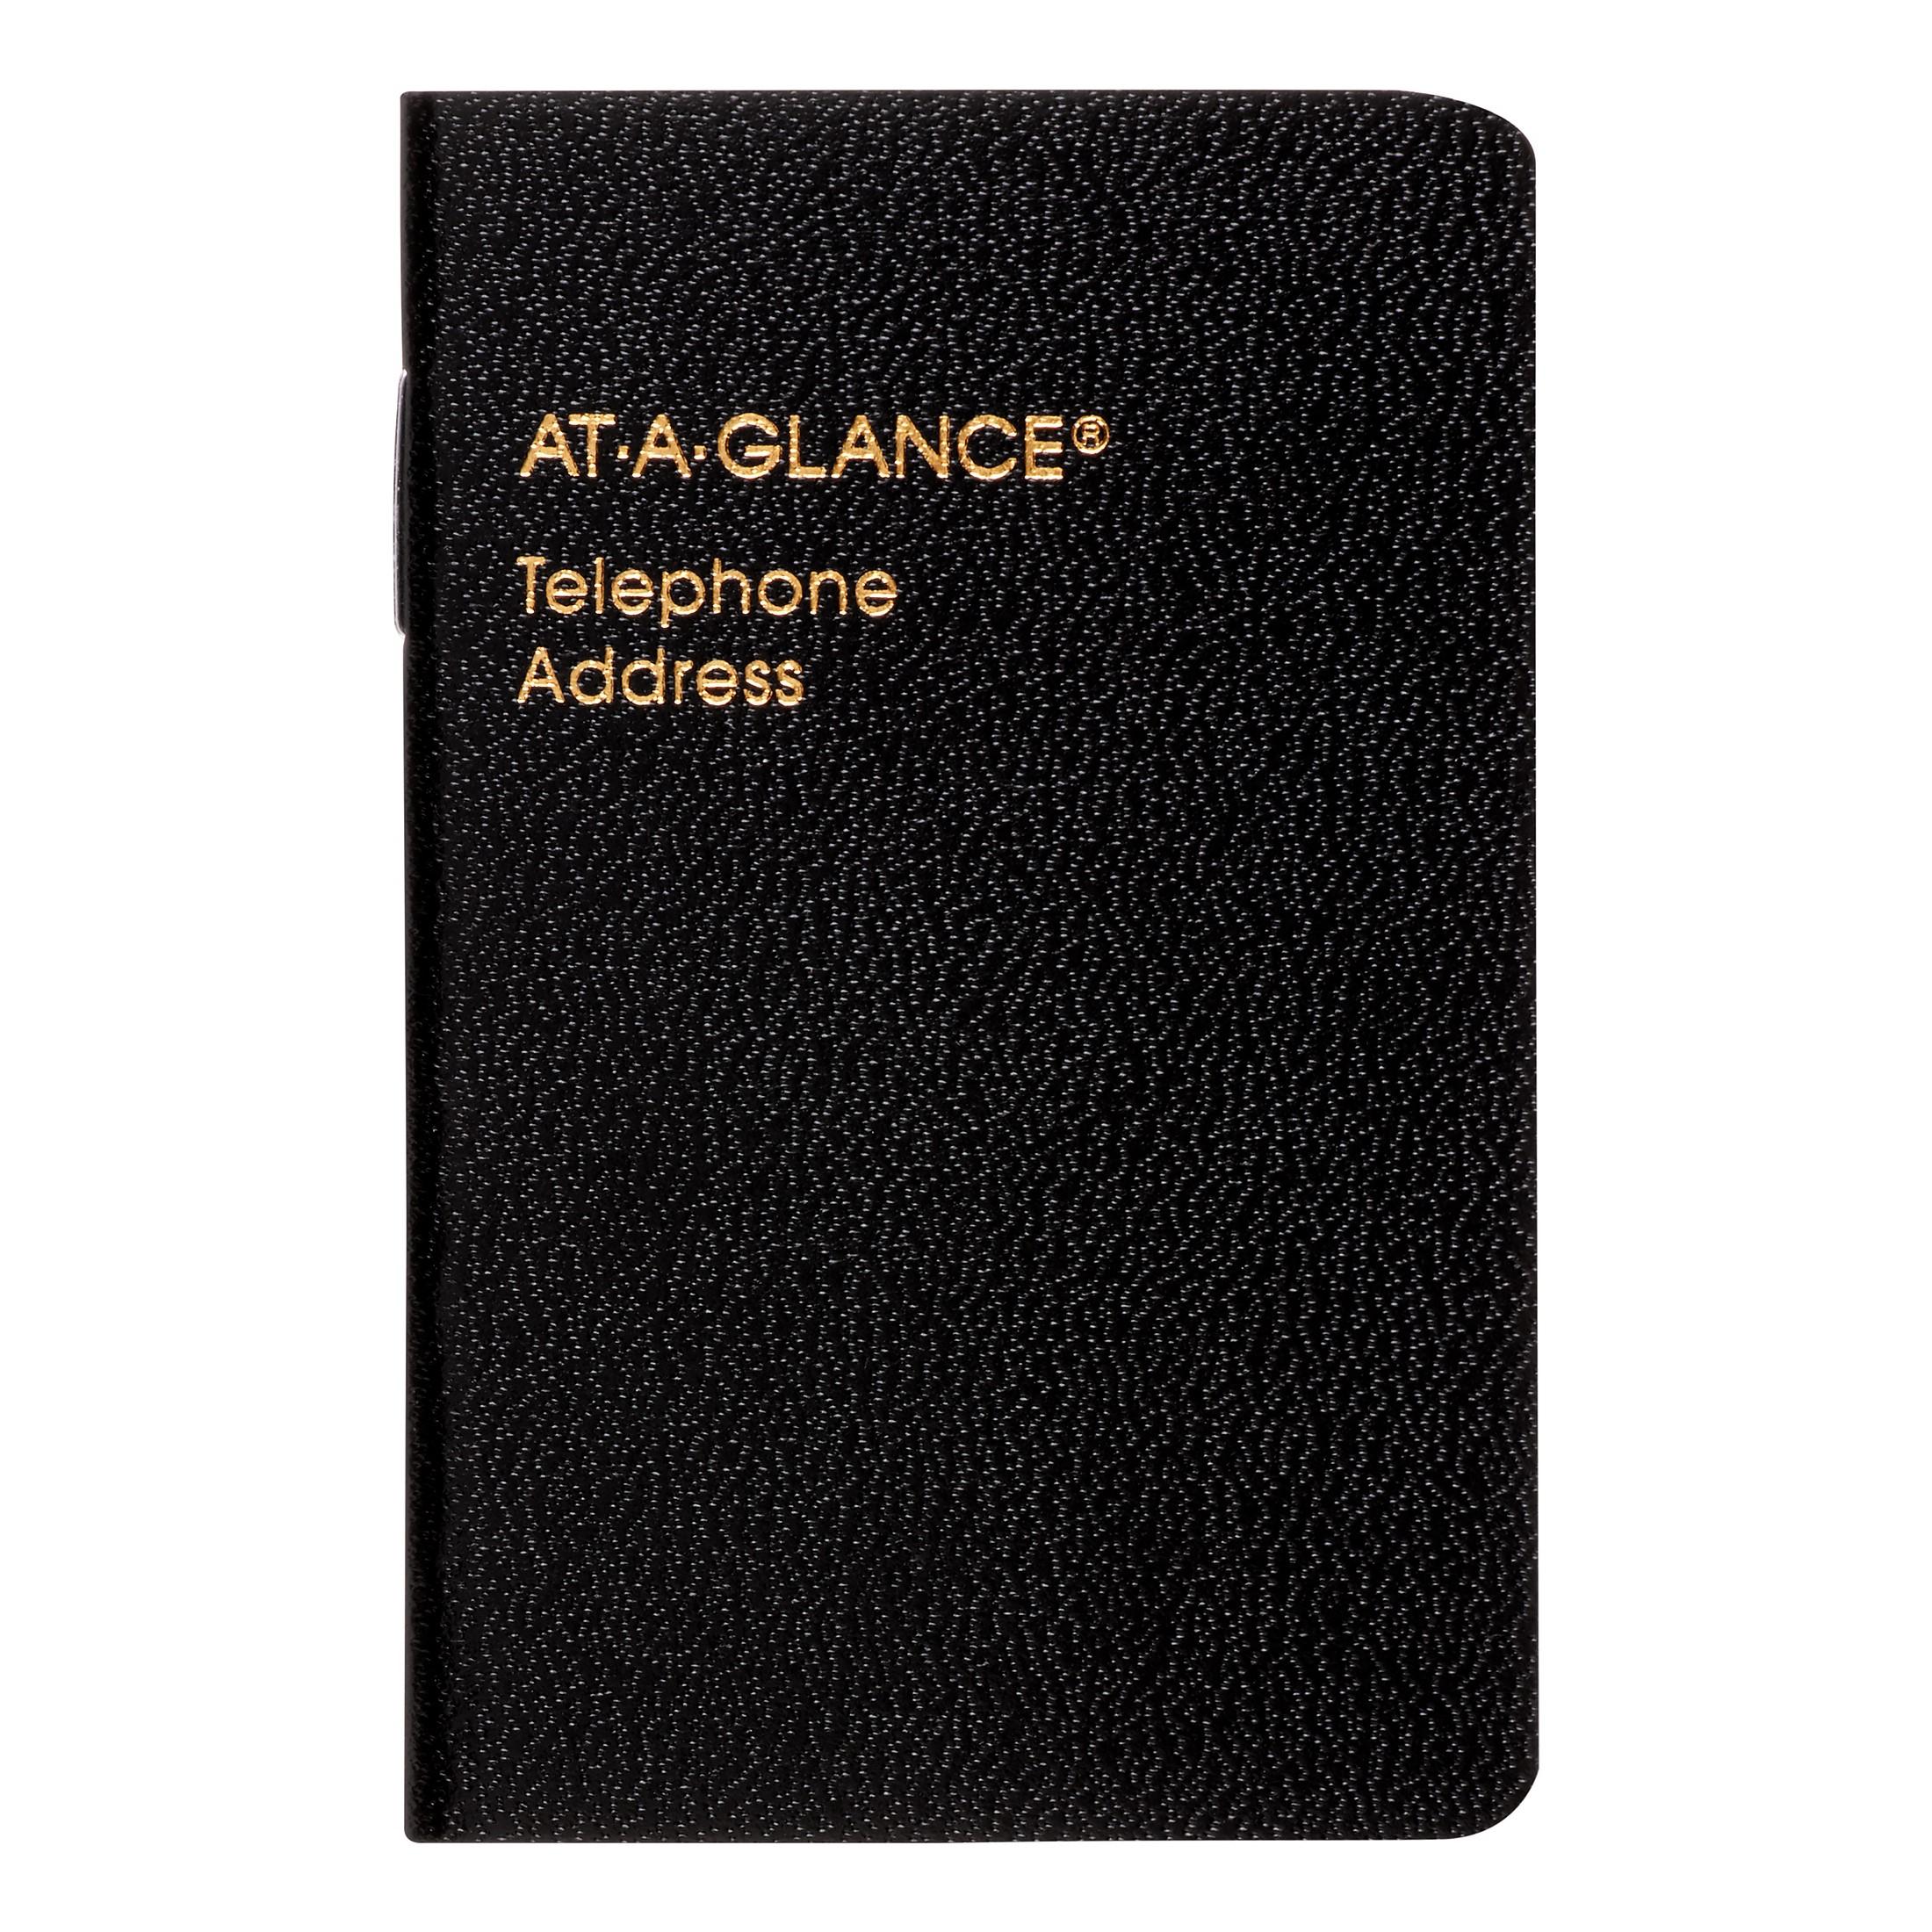 AT-A-GLANCE Pocket Telephone/Address Book, Black